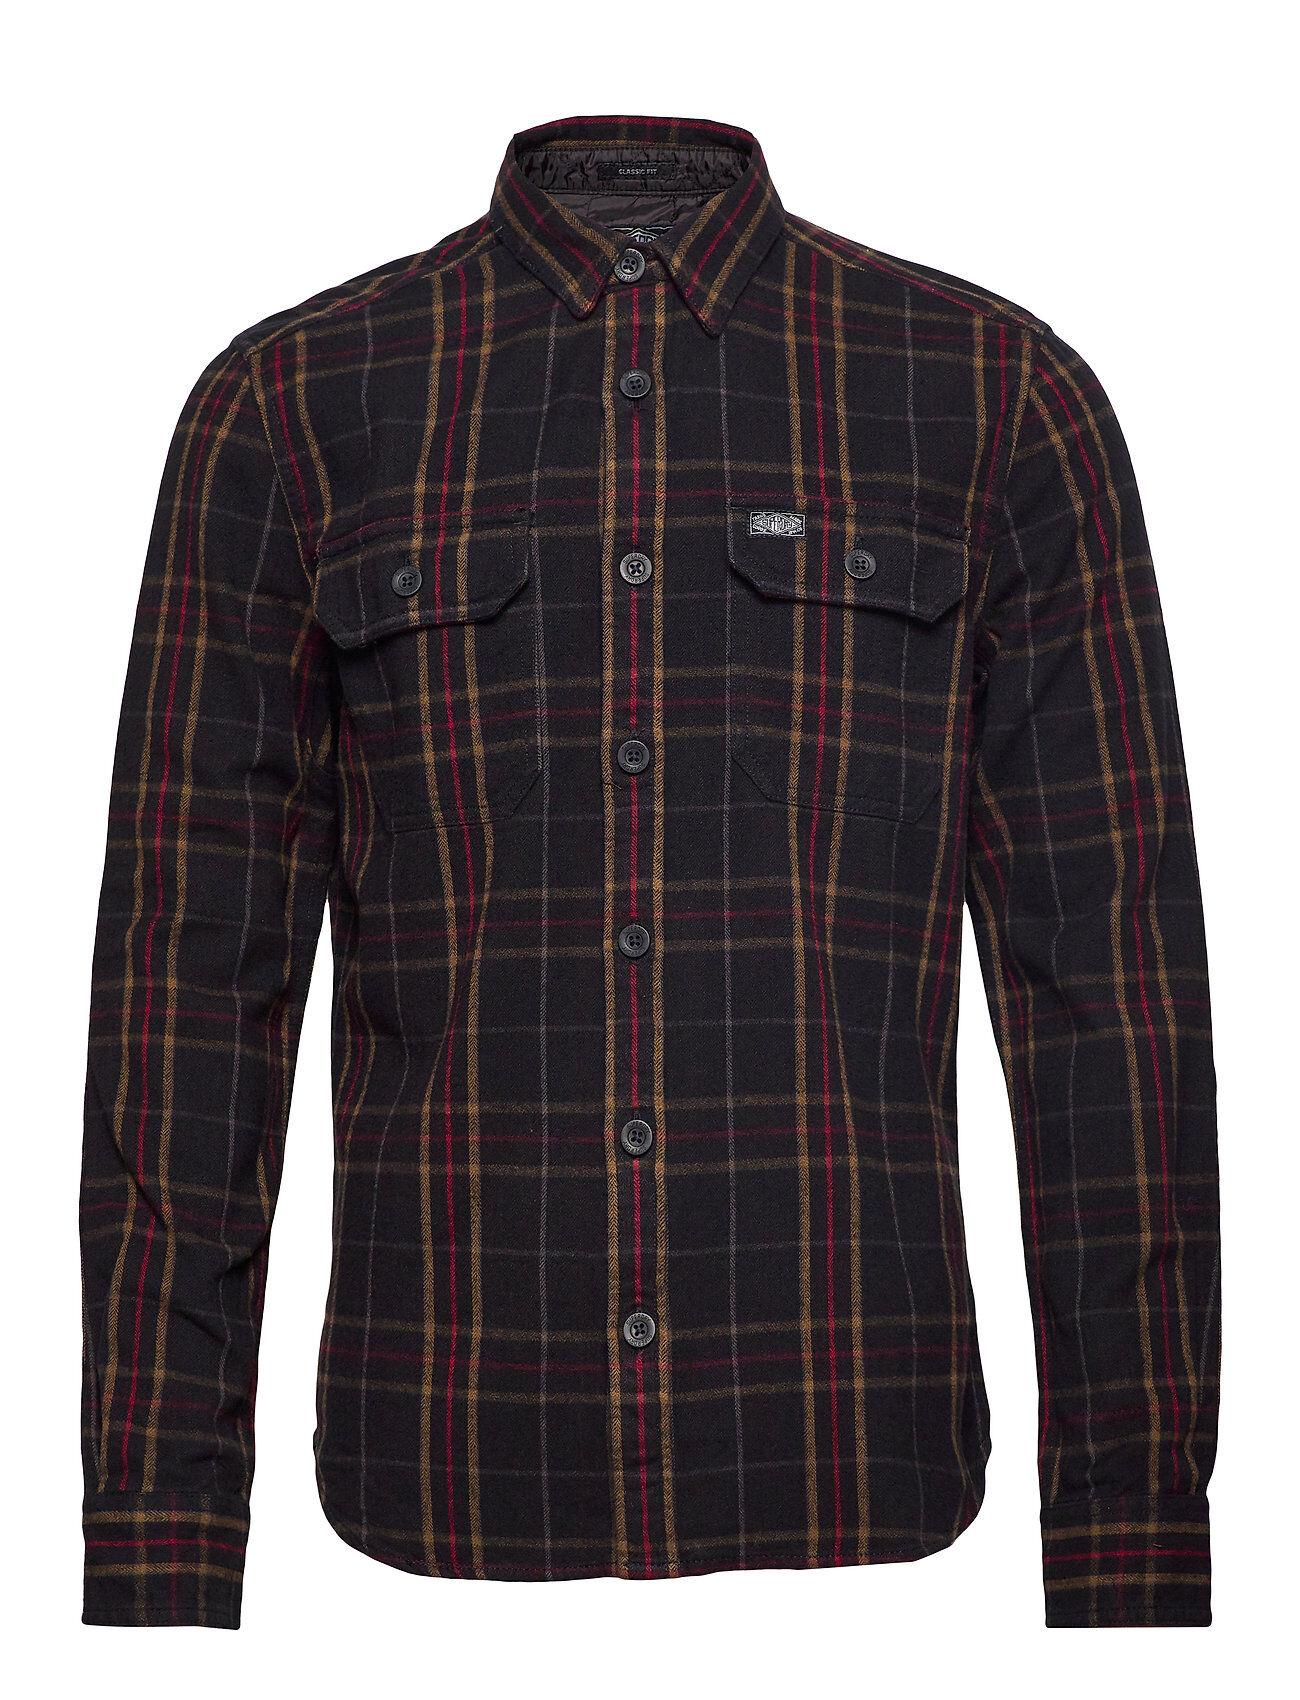 Superdry Merchant Milled L/S Shirt Paita Rento Casual Monivärinen/Kuvioitu